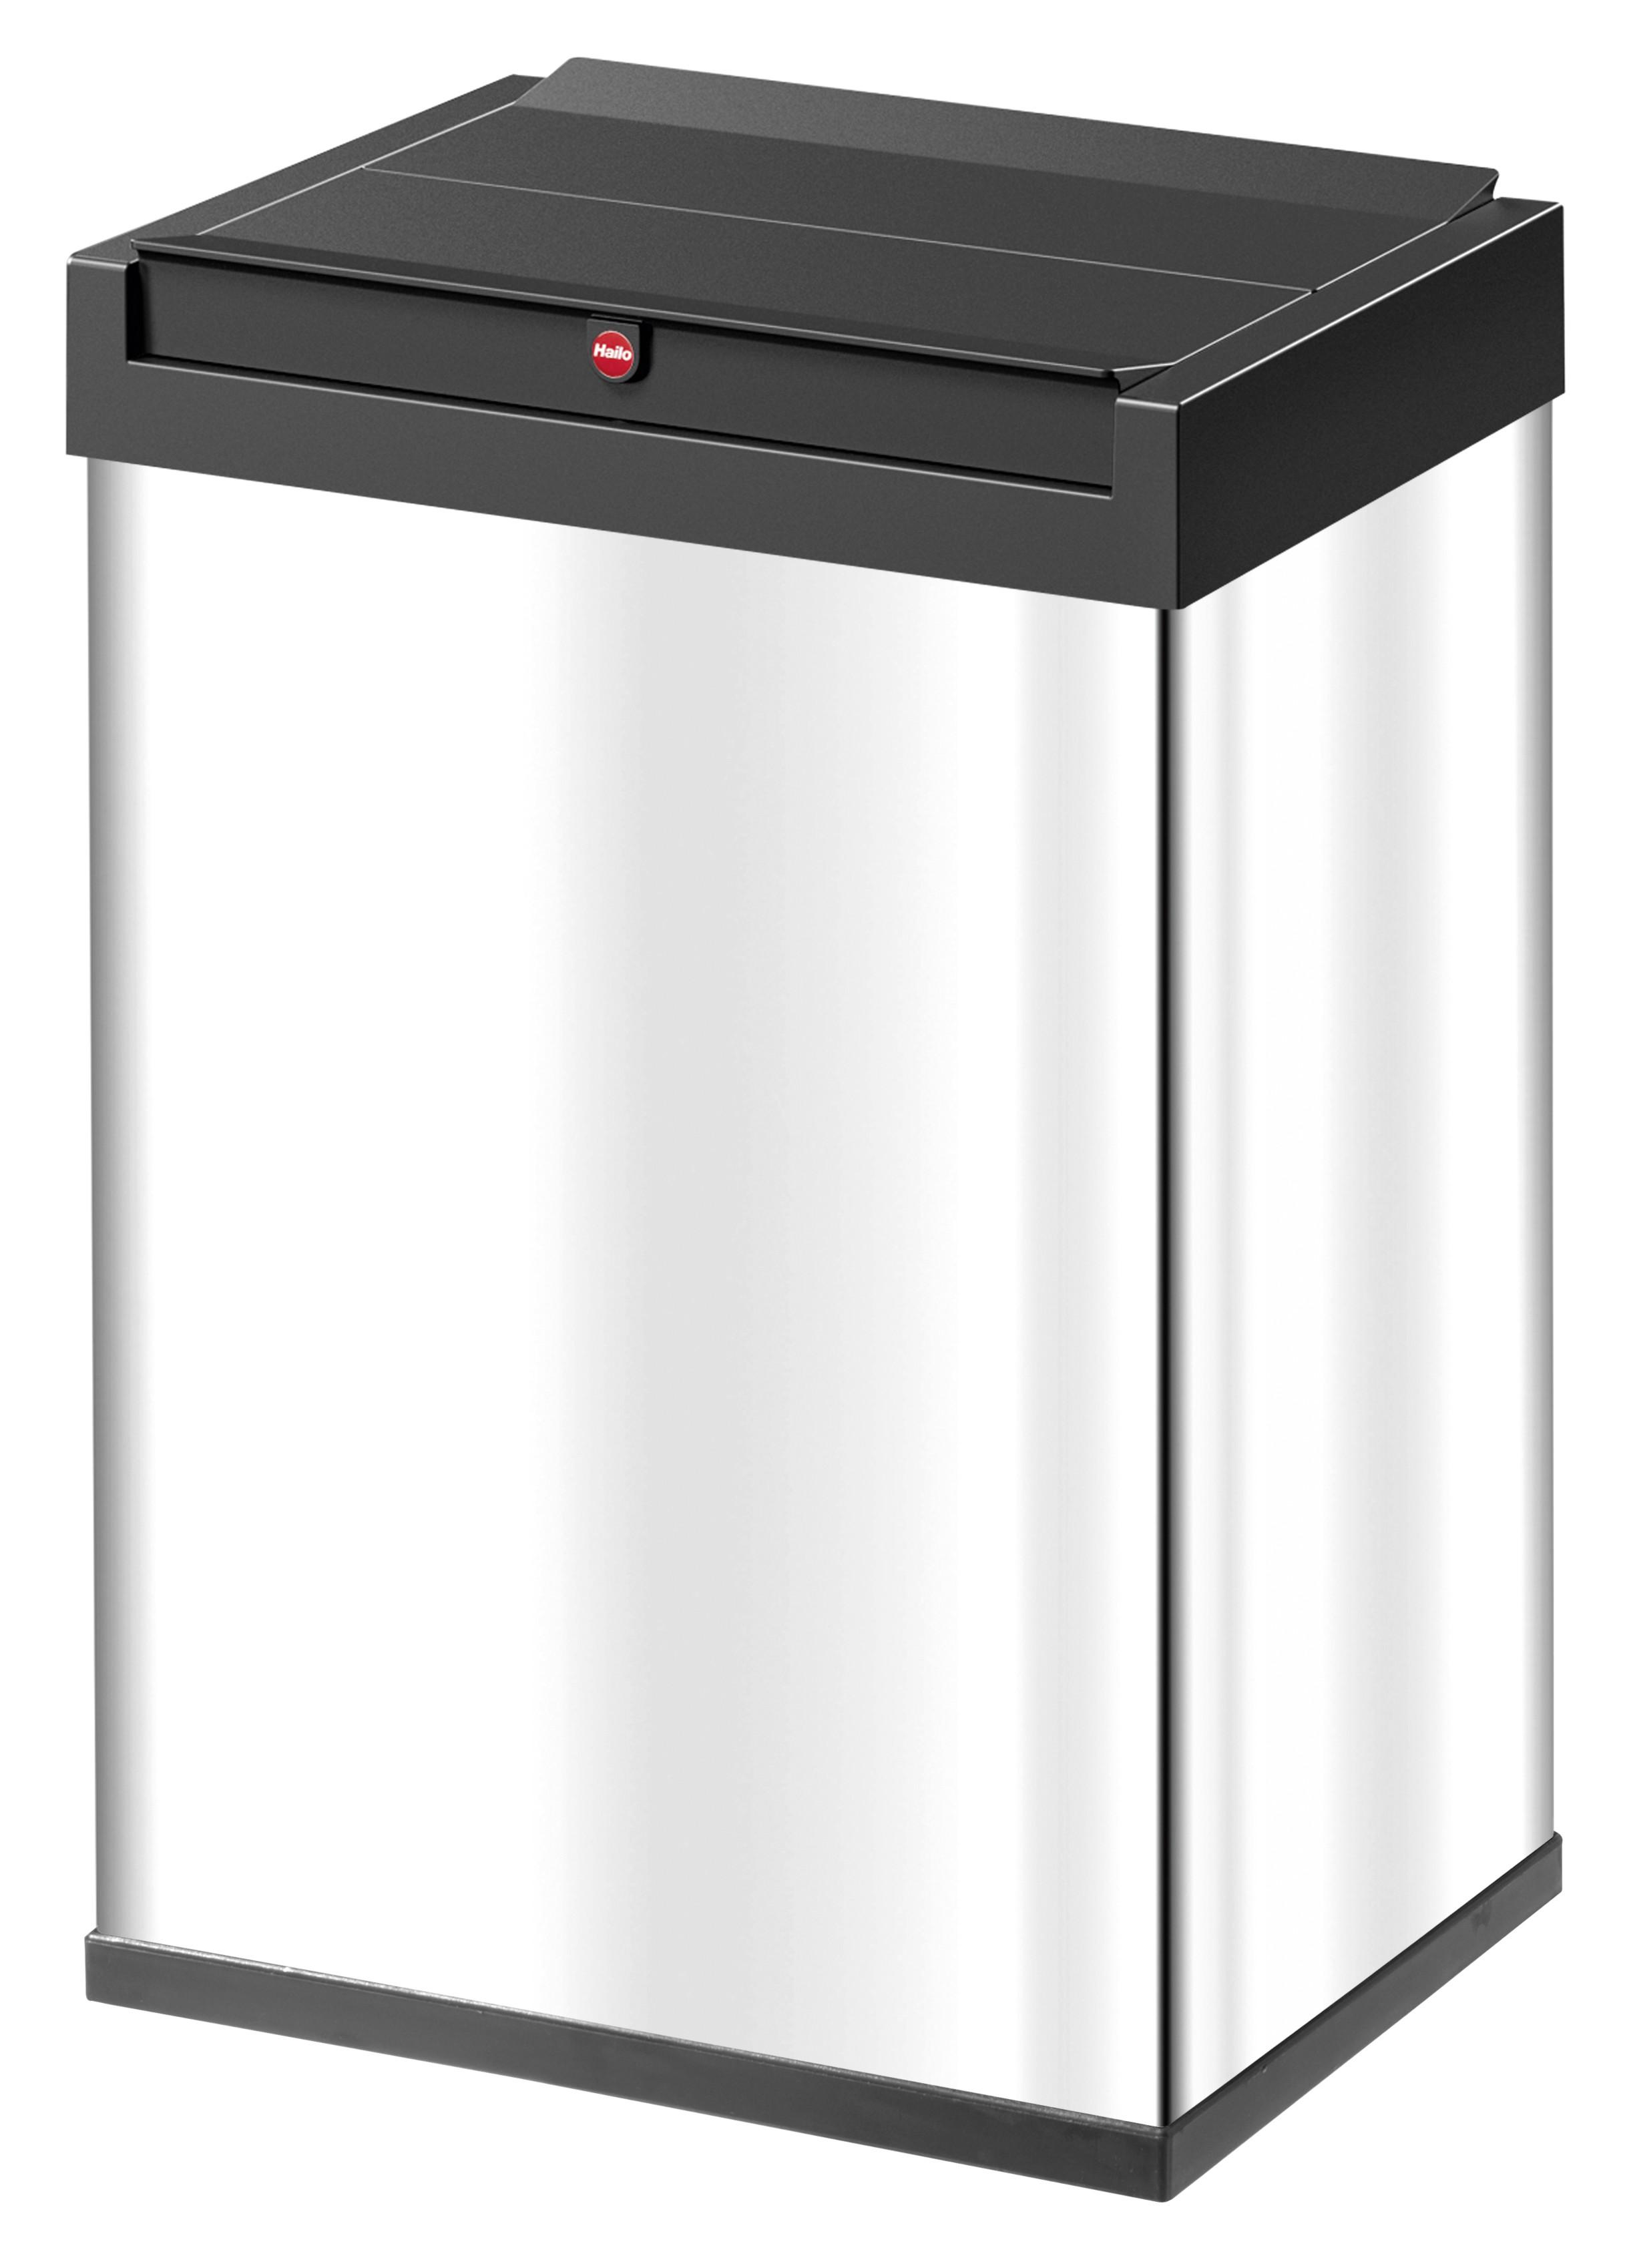 Hailo Big-Box Swing L, Edelstahl, 35 Liter, Großraum-Abfallbox